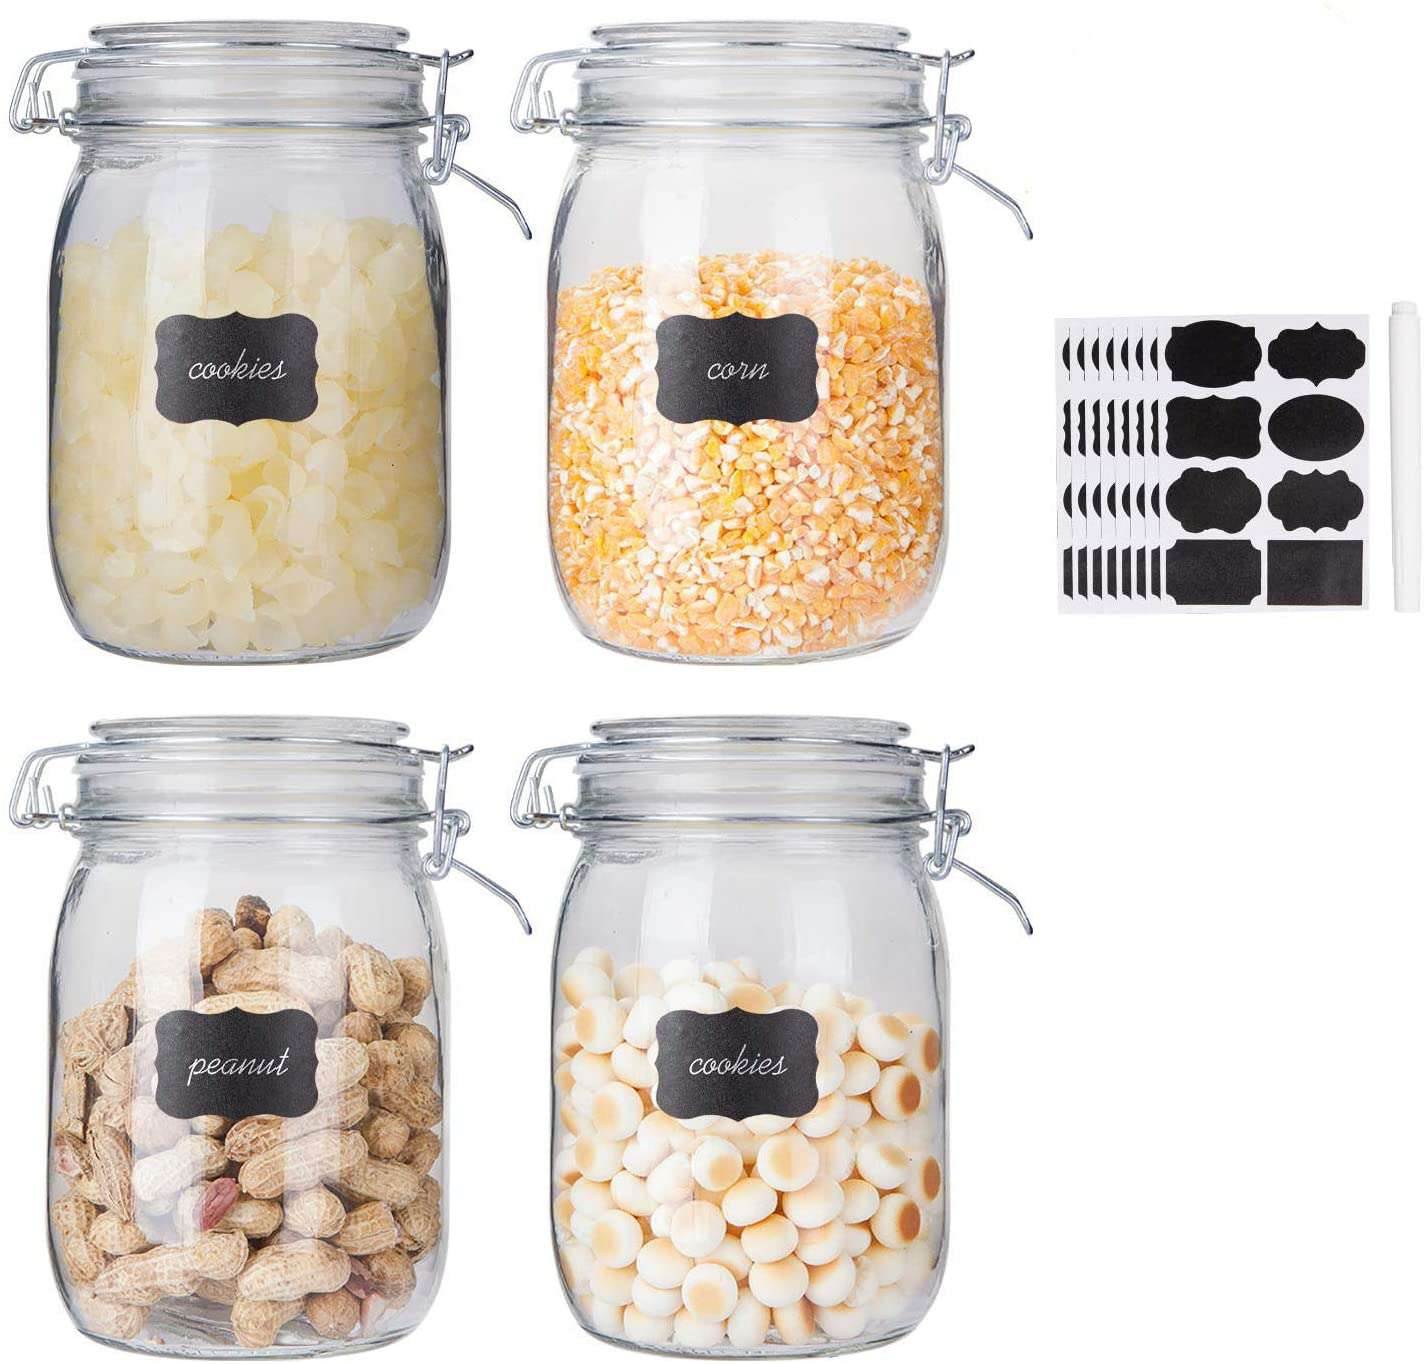 Flrolove Glass Kitchen Storage Canister Mason Jars with Lids